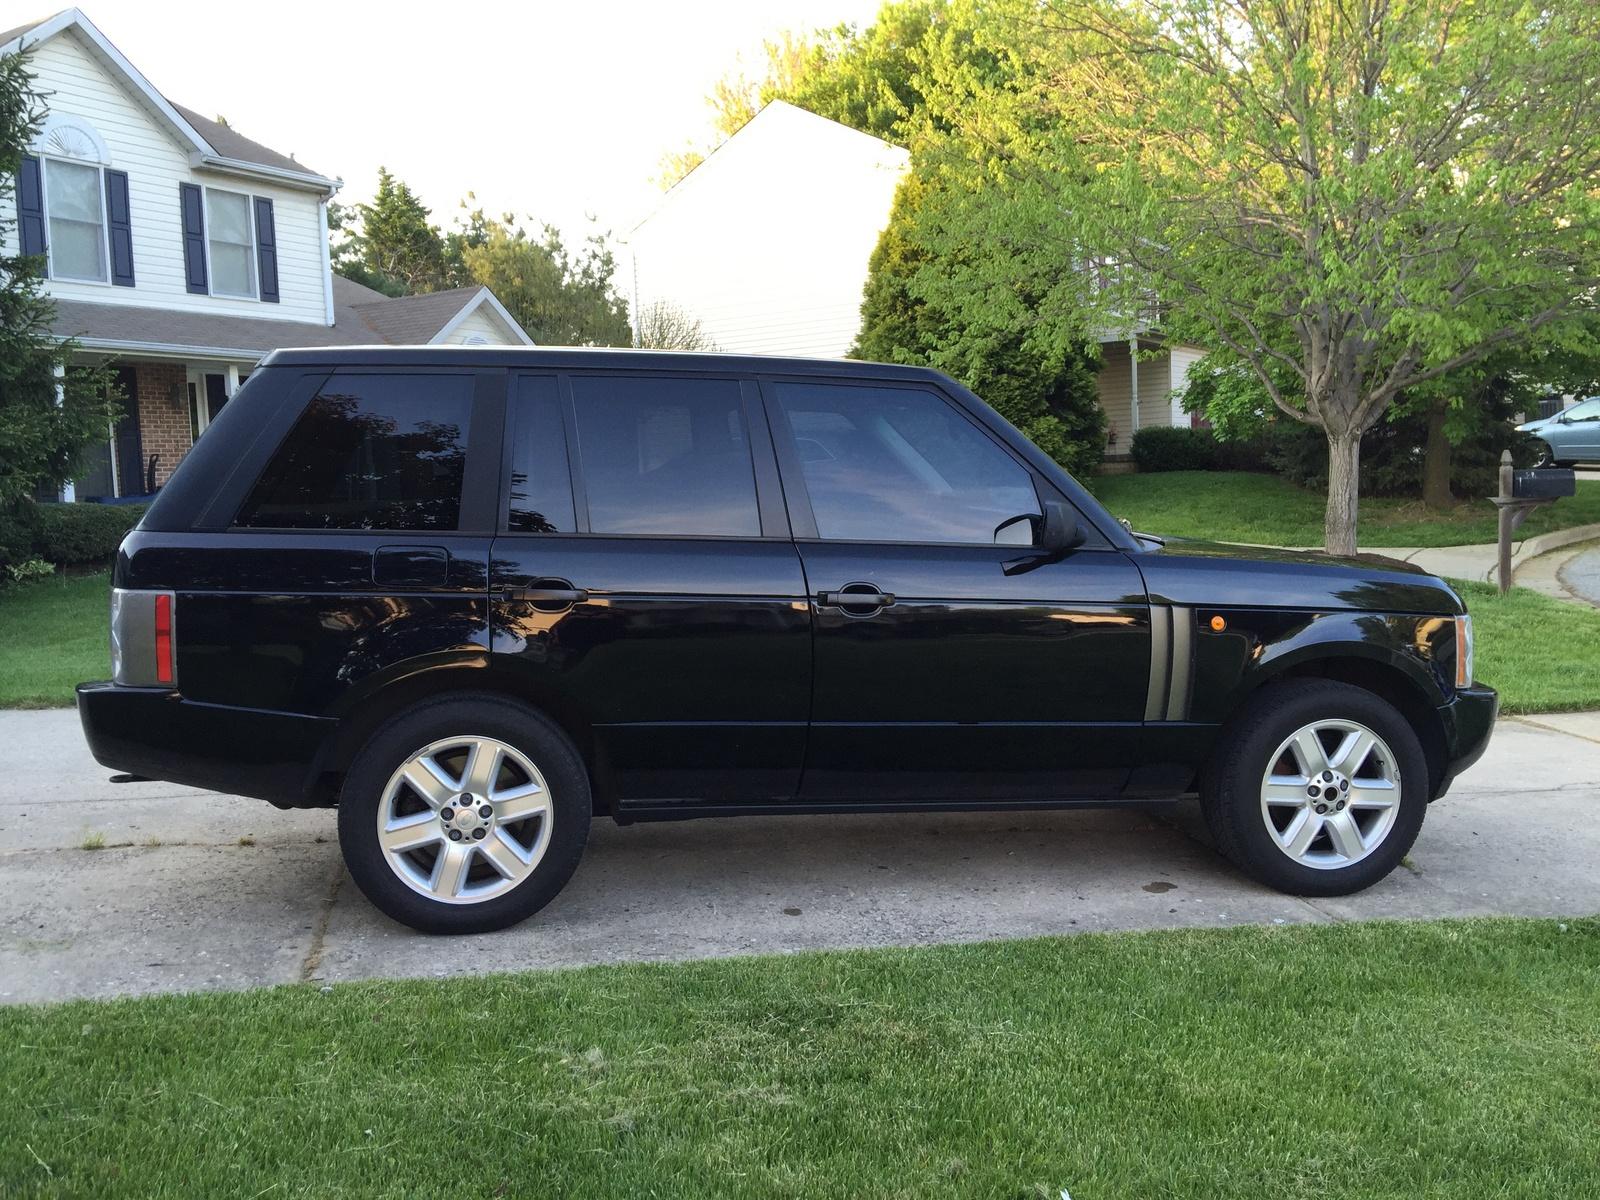 land rover discovery hse 2004 car interior design. Black Bedroom Furniture Sets. Home Design Ideas